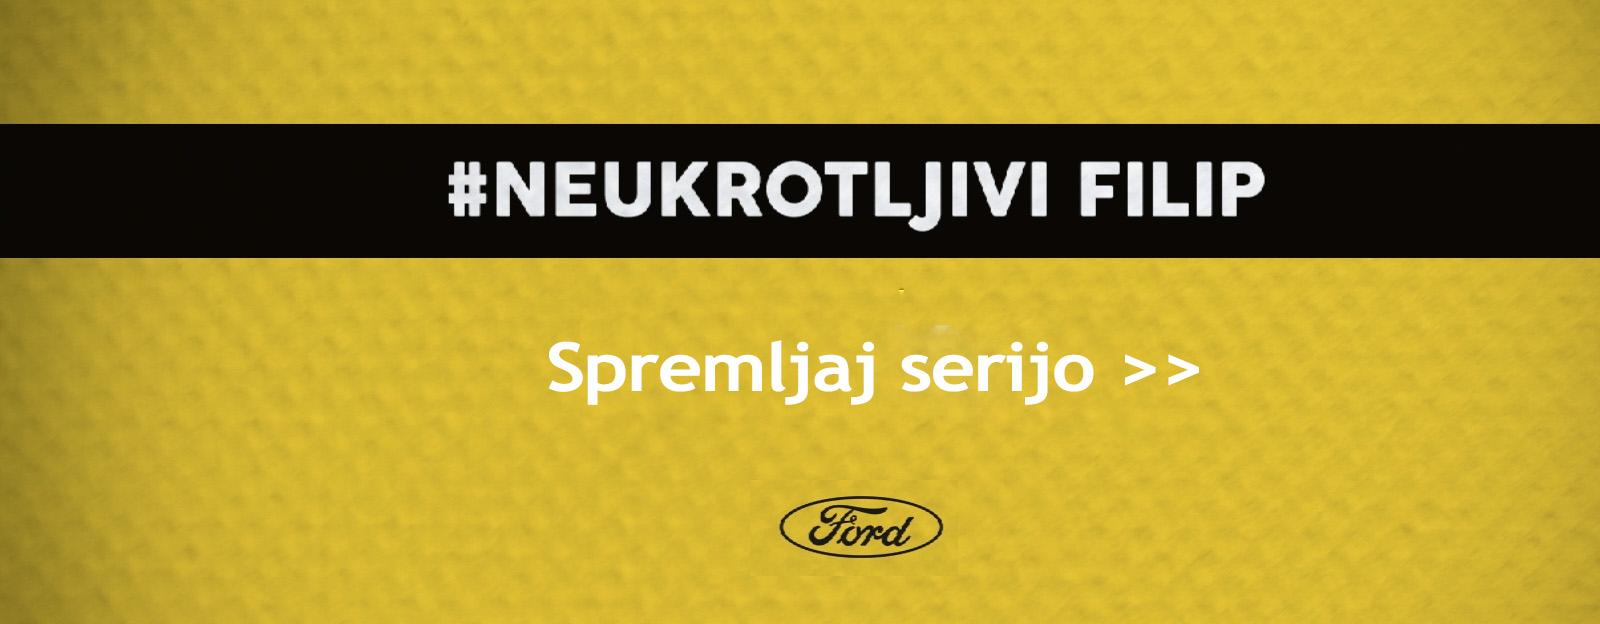 #Neukrotljivi: prvi gost Filipa Flisarja je komik Aleš Novak